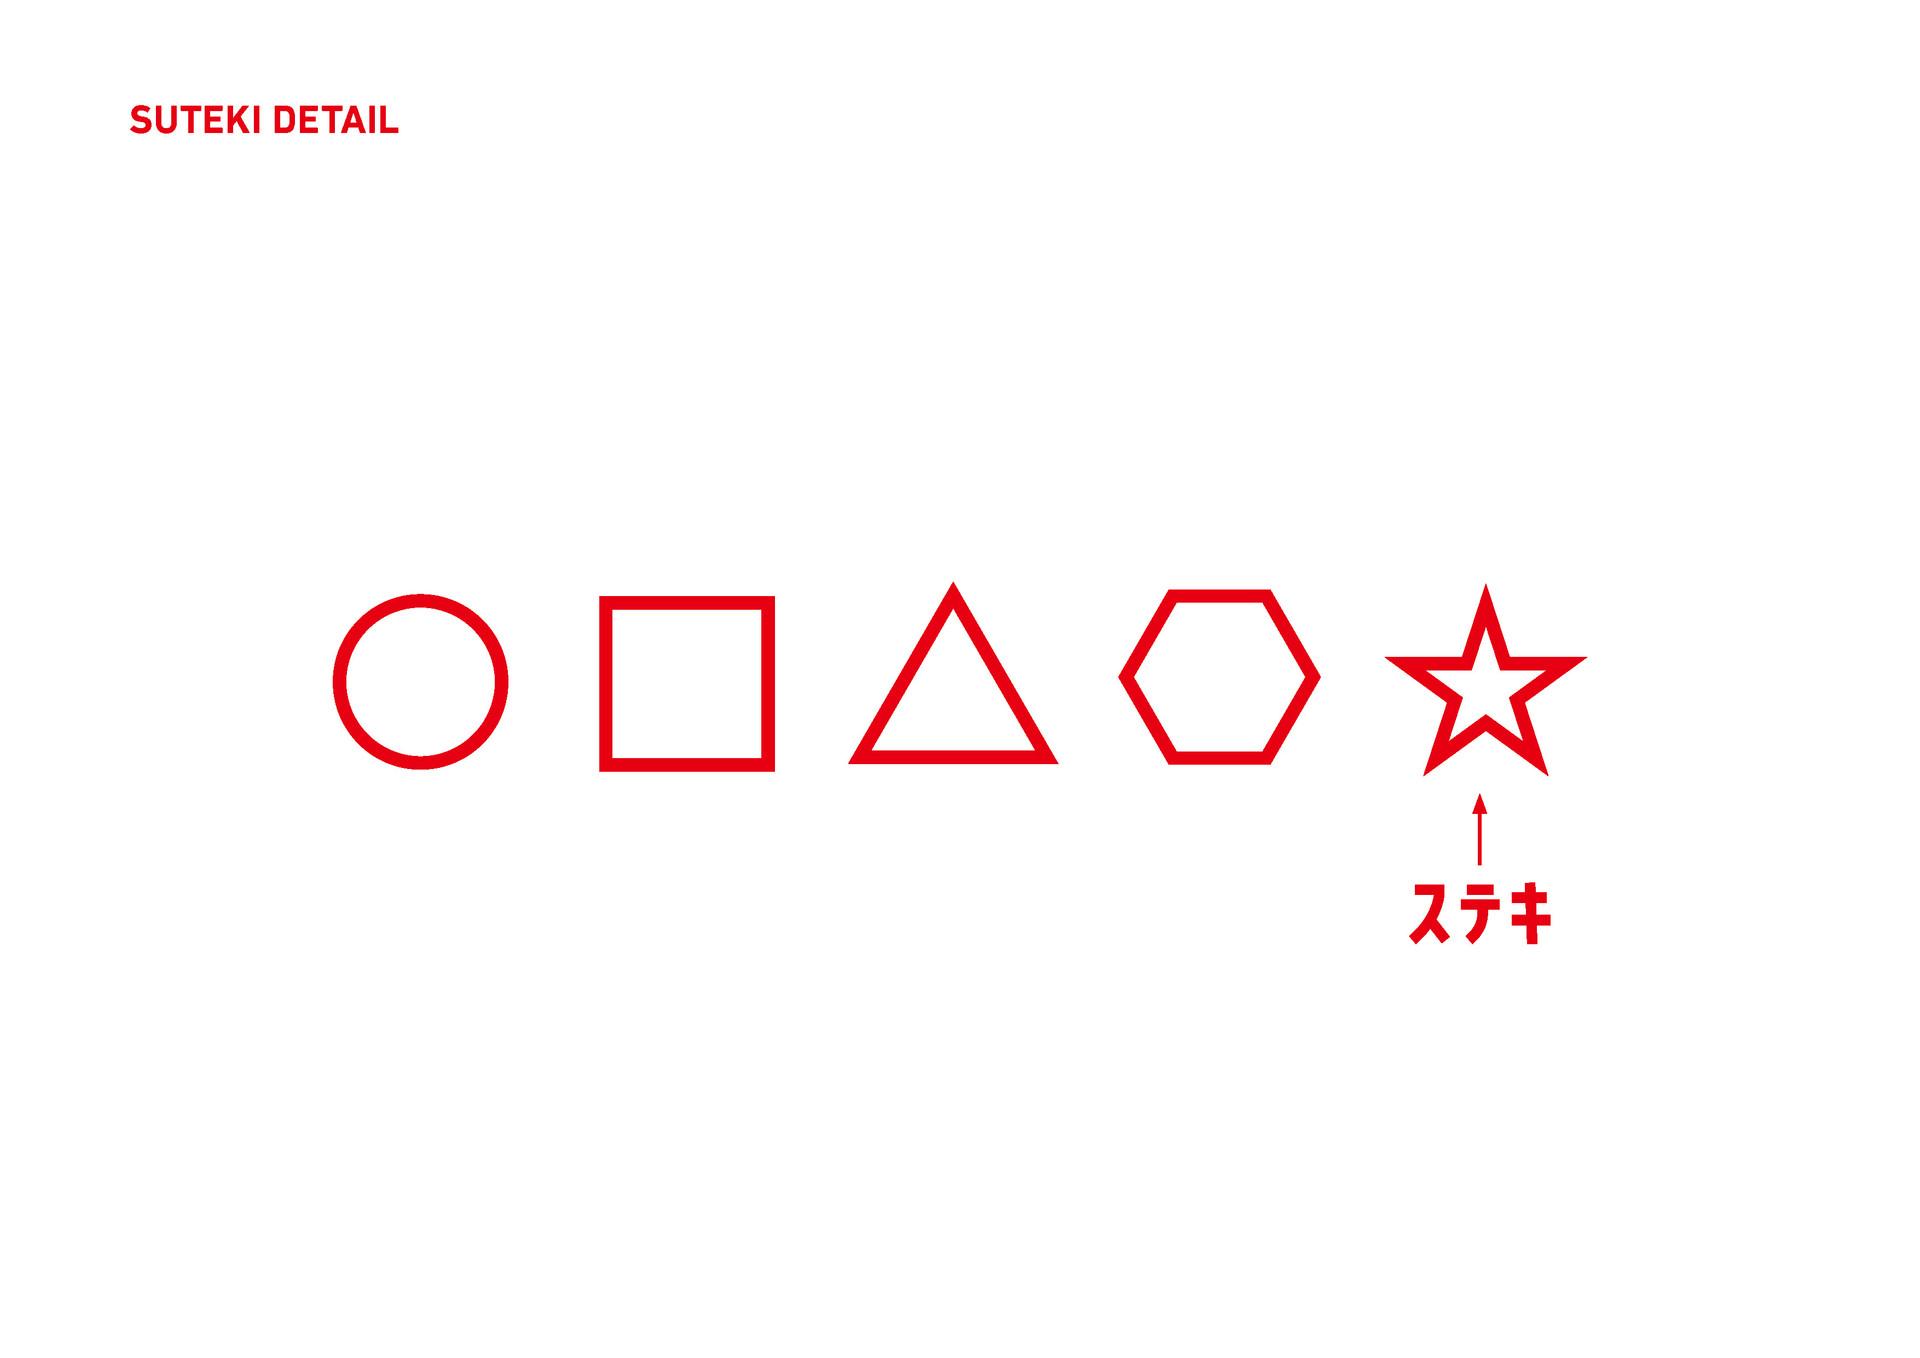 suteki_logo_2.jpg